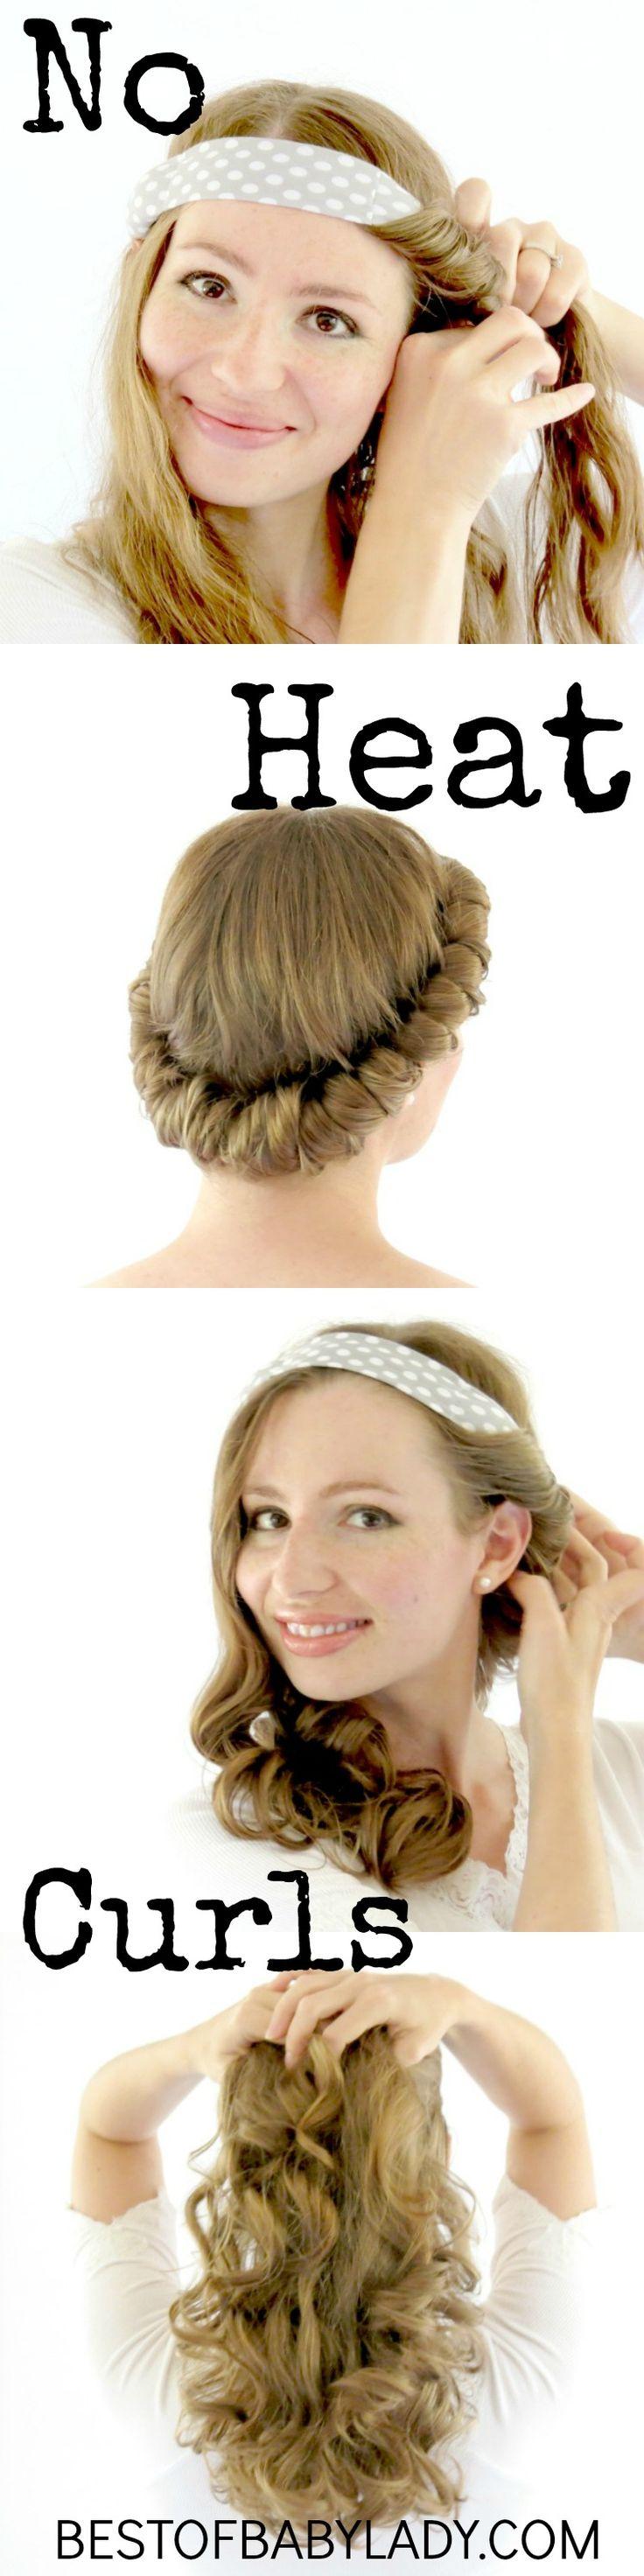 Miraculous 1000 Ideas About Overnight Hairstyles On Pinterest Bandana Short Hairstyles Gunalazisus